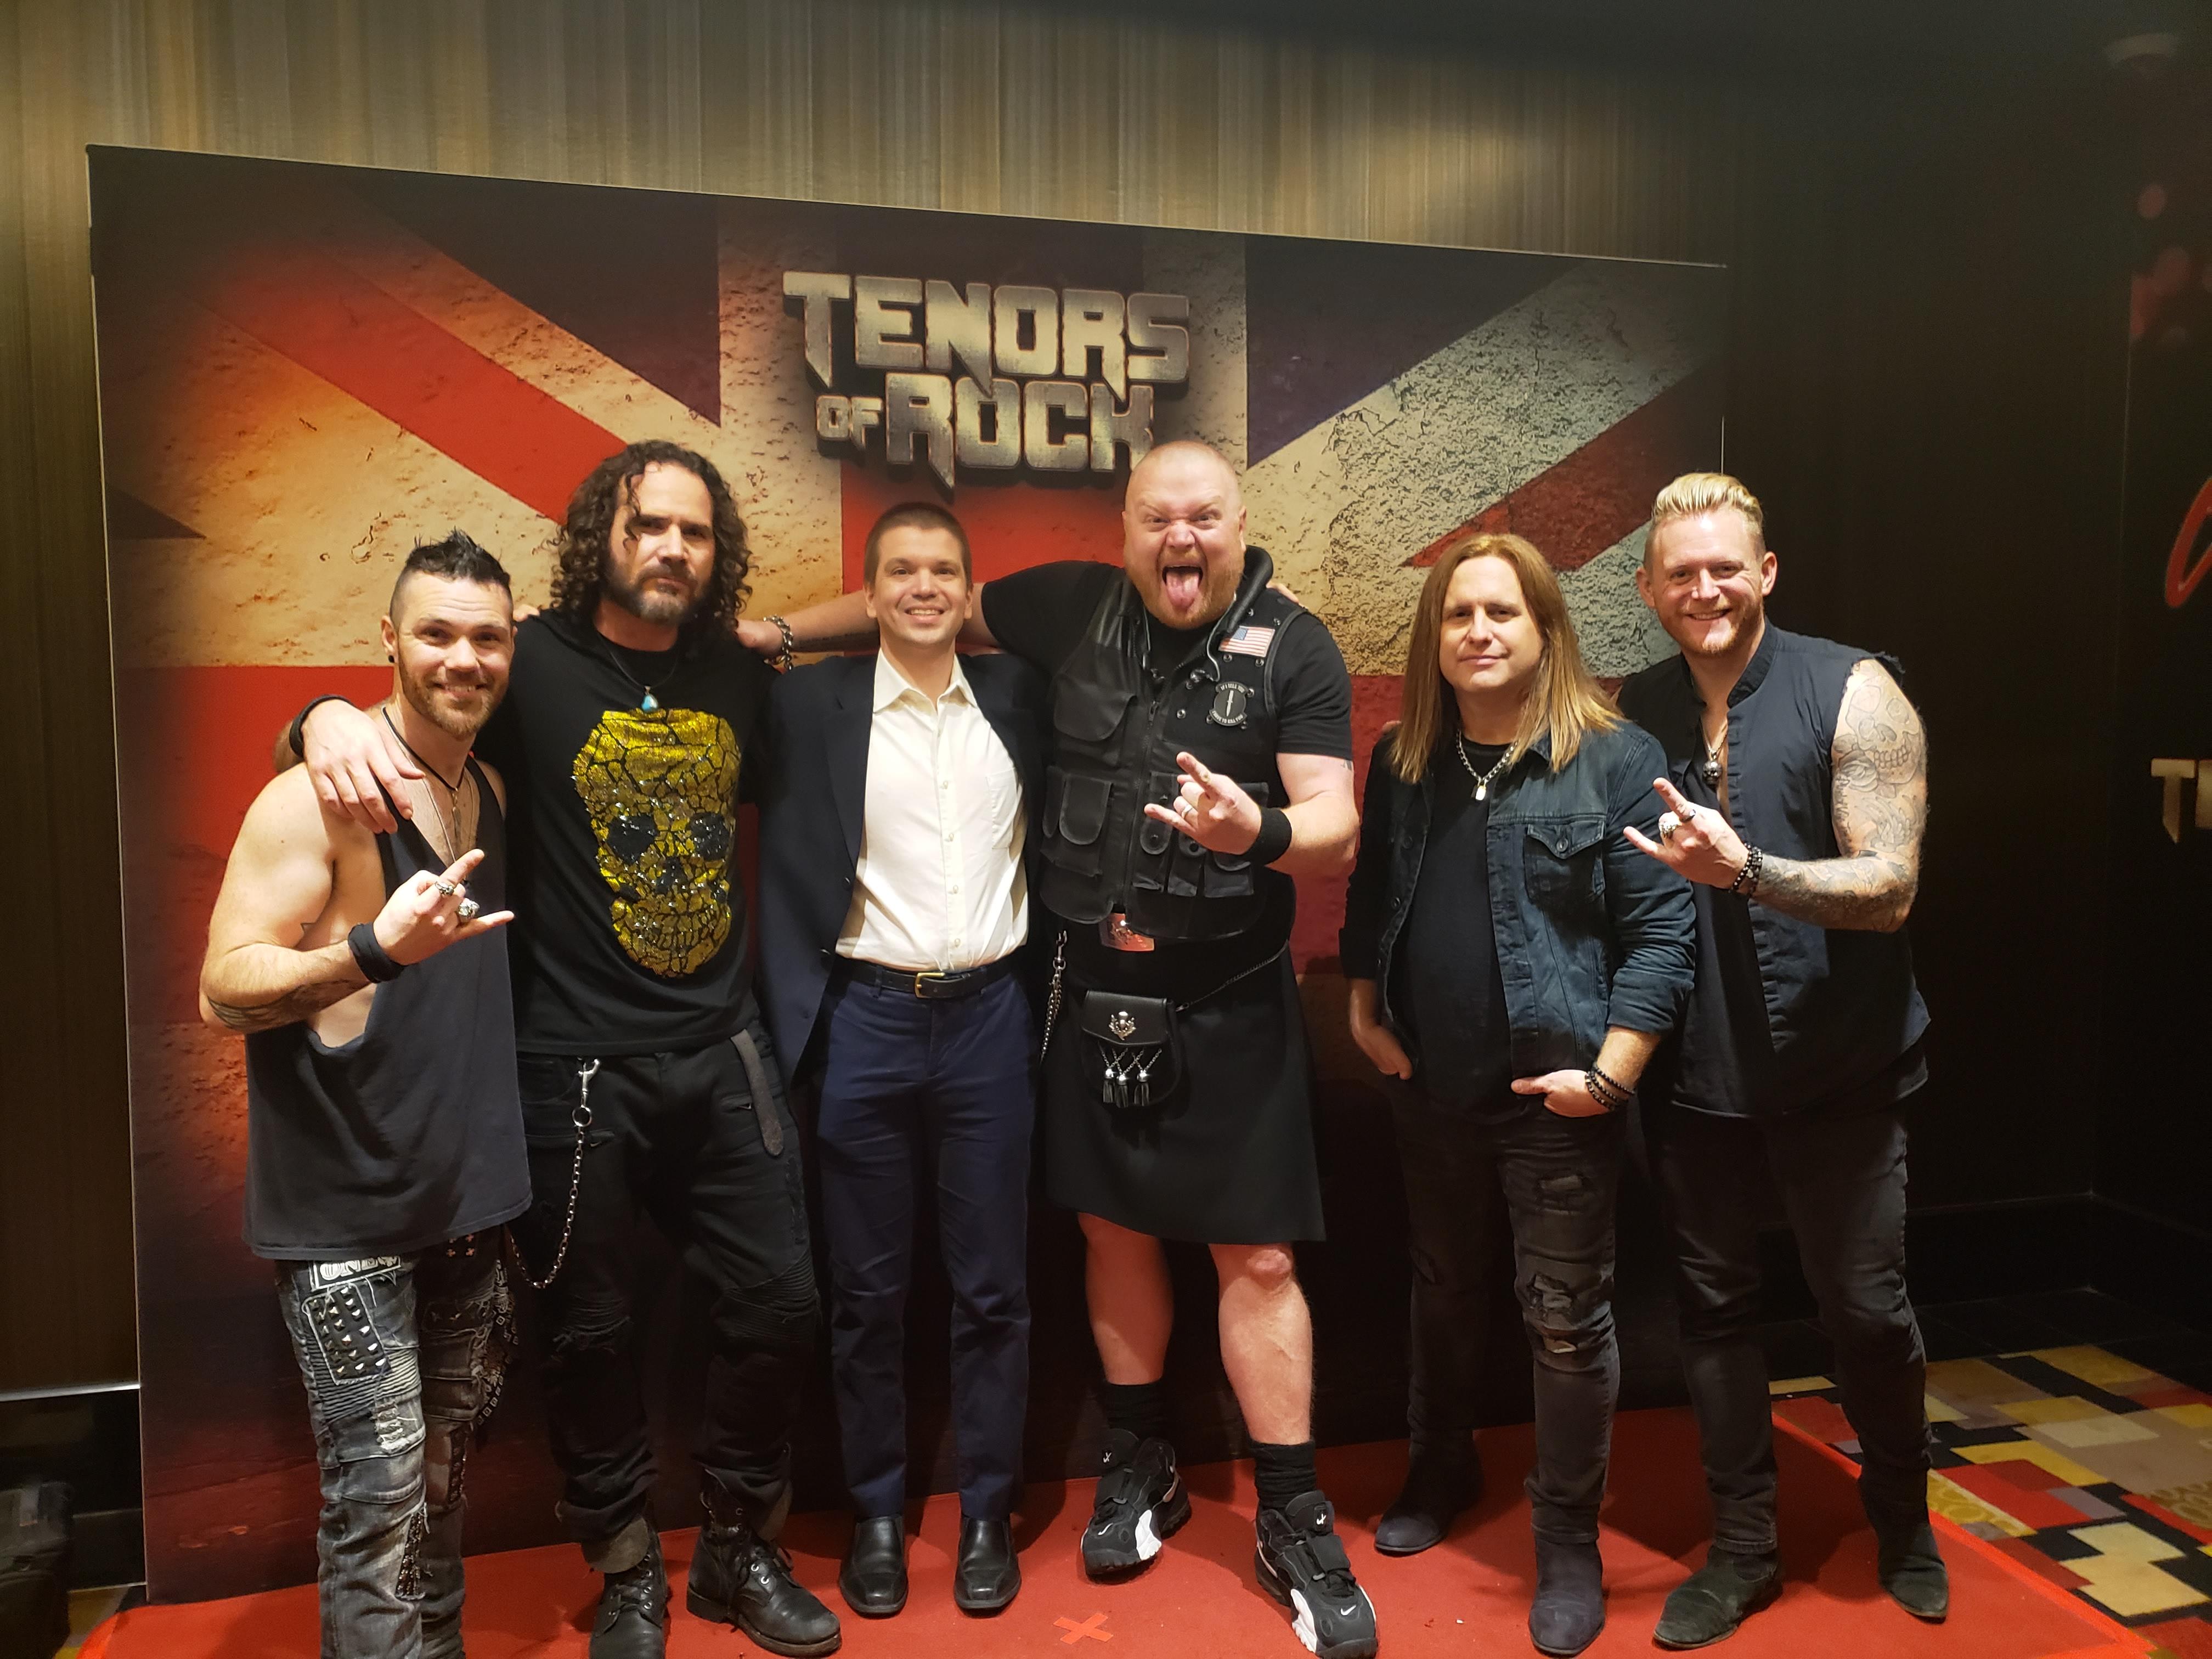 "Tenors of Rock Las Vegas, Tenors of Rock Las Vegas Show, Tenors of Rock 2019, Chris Yandek, Tenors of Rock Las Vegas, David ""Dai"" Richards, Jimmy Denning, Jonathan Williams, Dan Schumann"